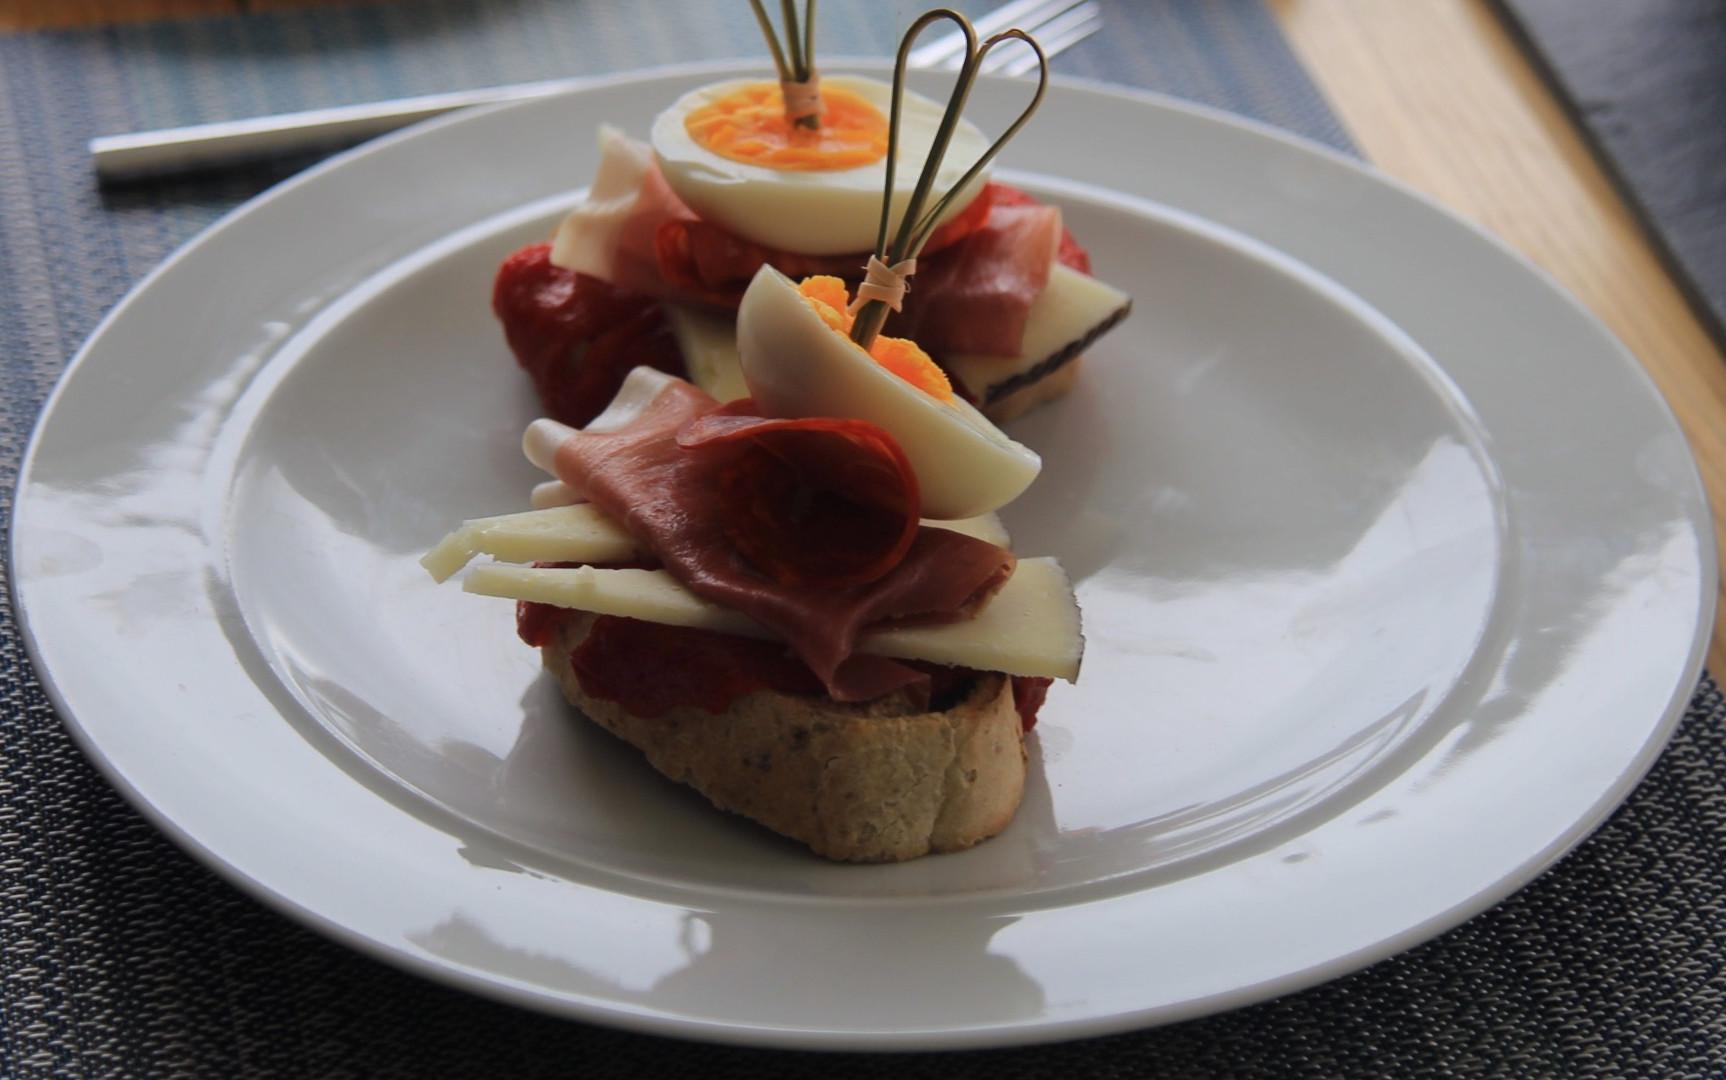 Montadito - veggie option available